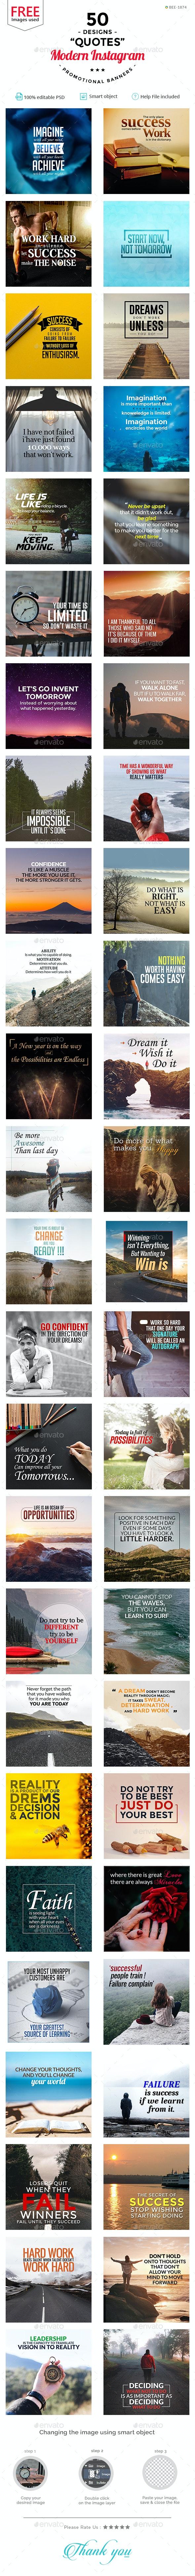 Quotes Instagram Templates - 50 Designs - Miscellaneous Social Media